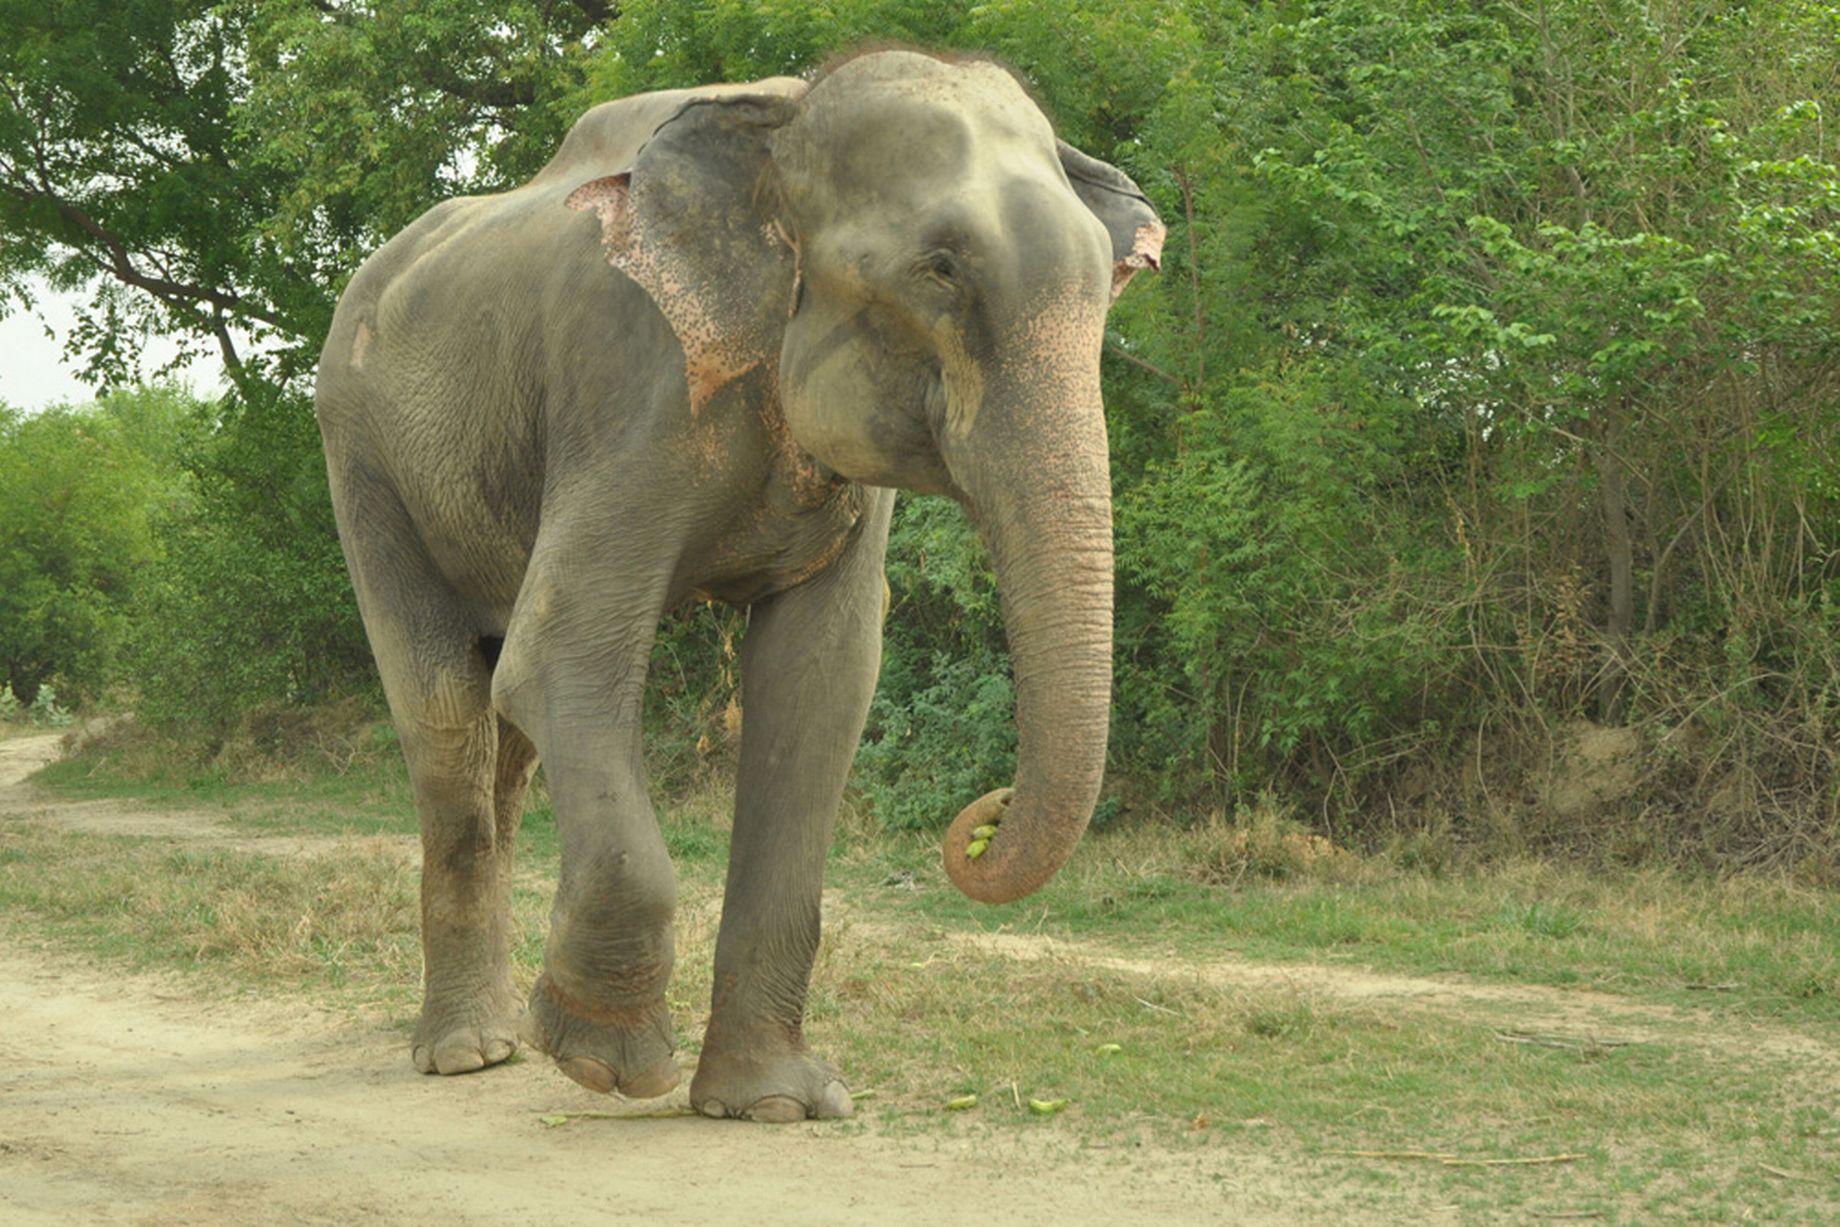 Raju the elephant free at last